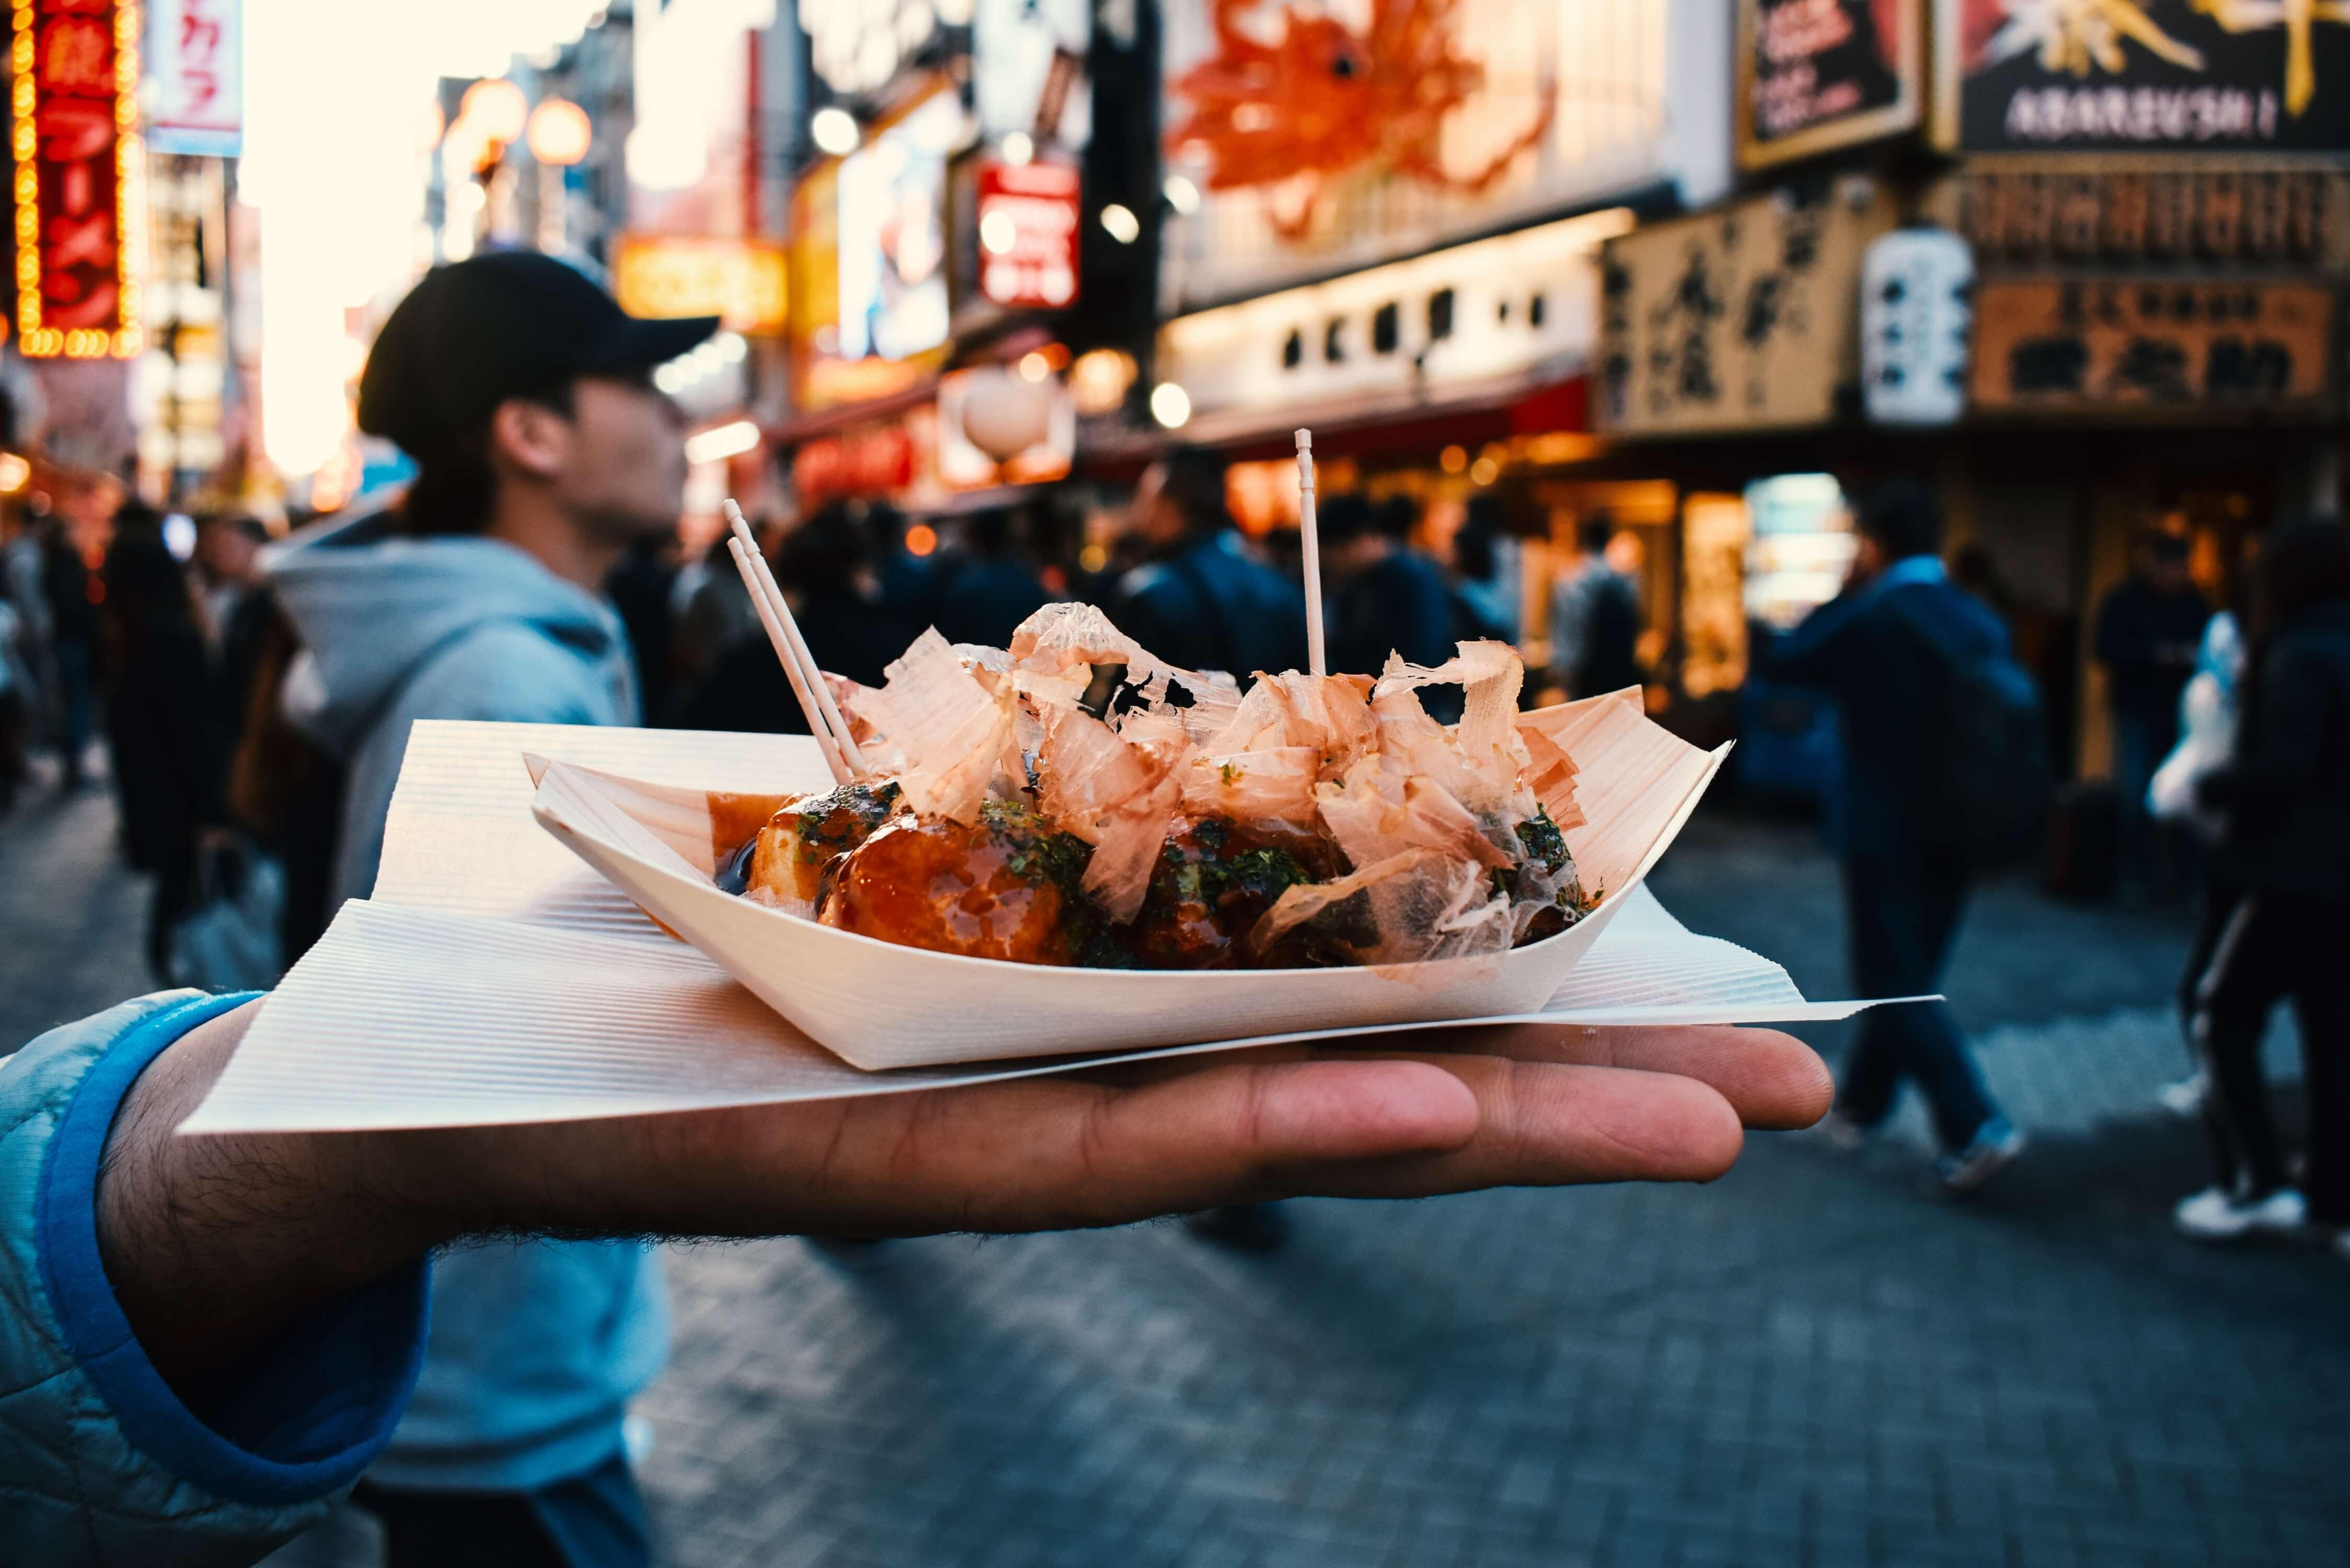 Eating takoyaki in Dotombori in Osaka